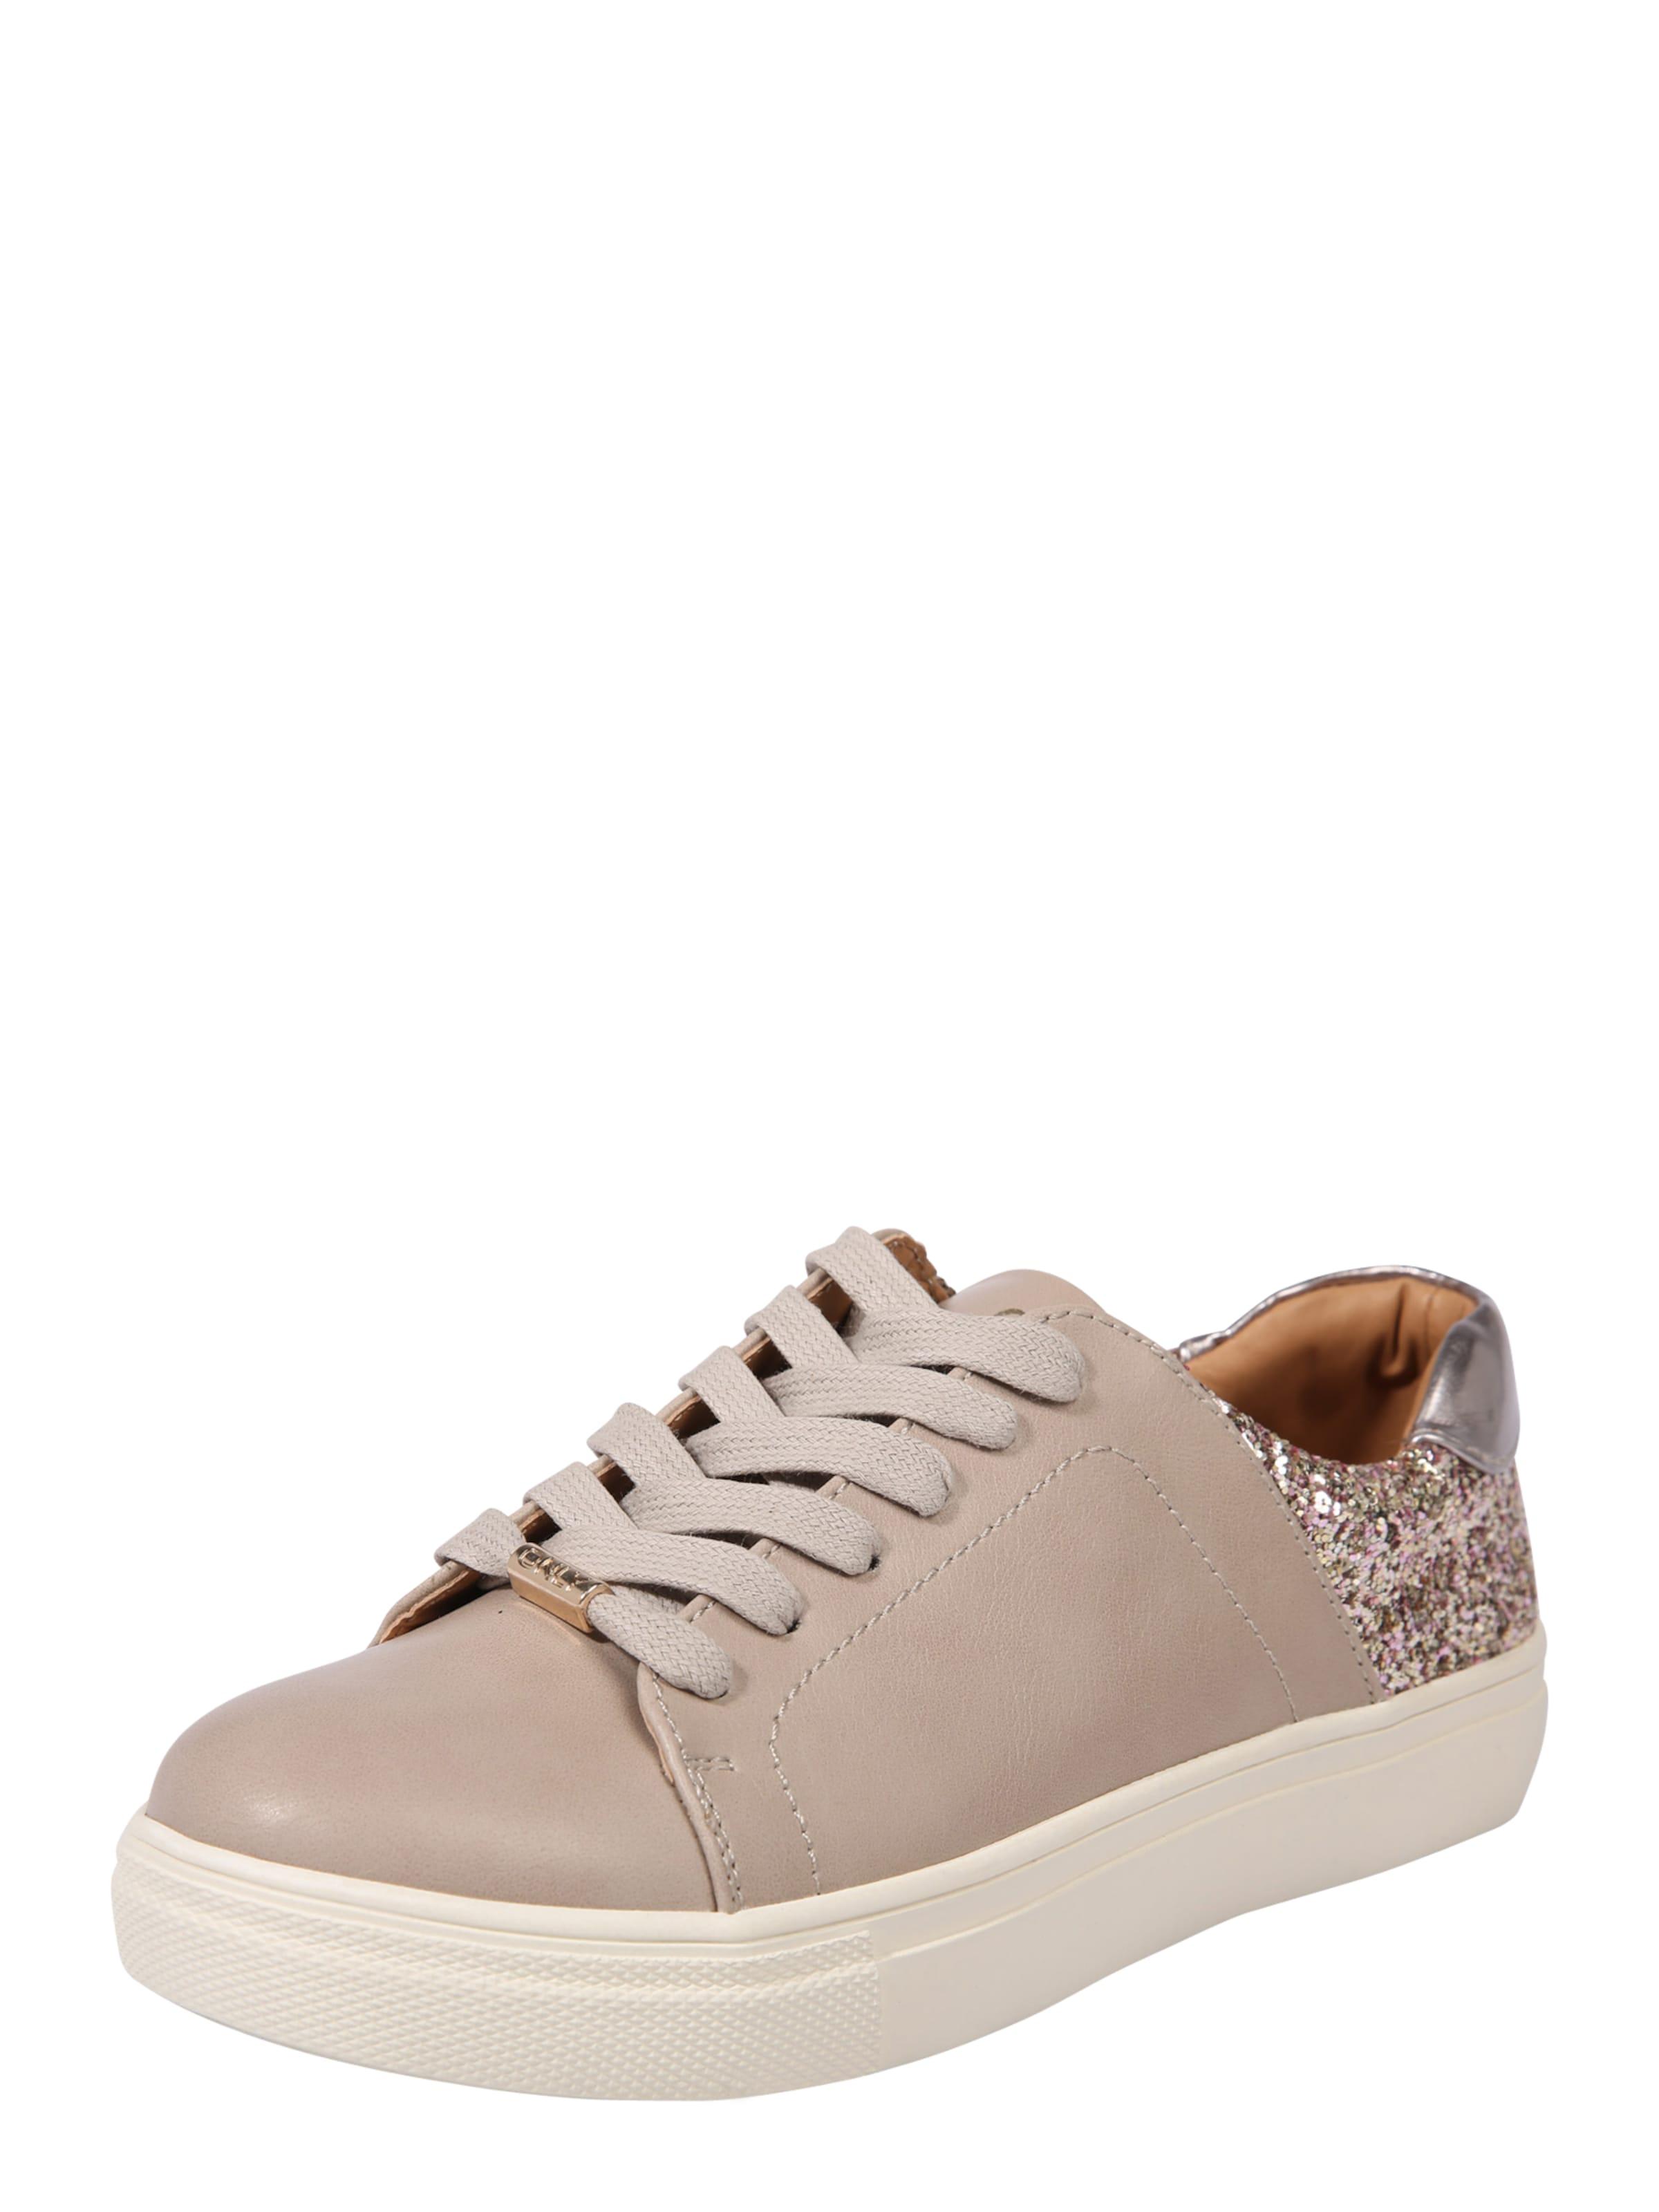 ONLY Sneaker  SAGE GLITTER